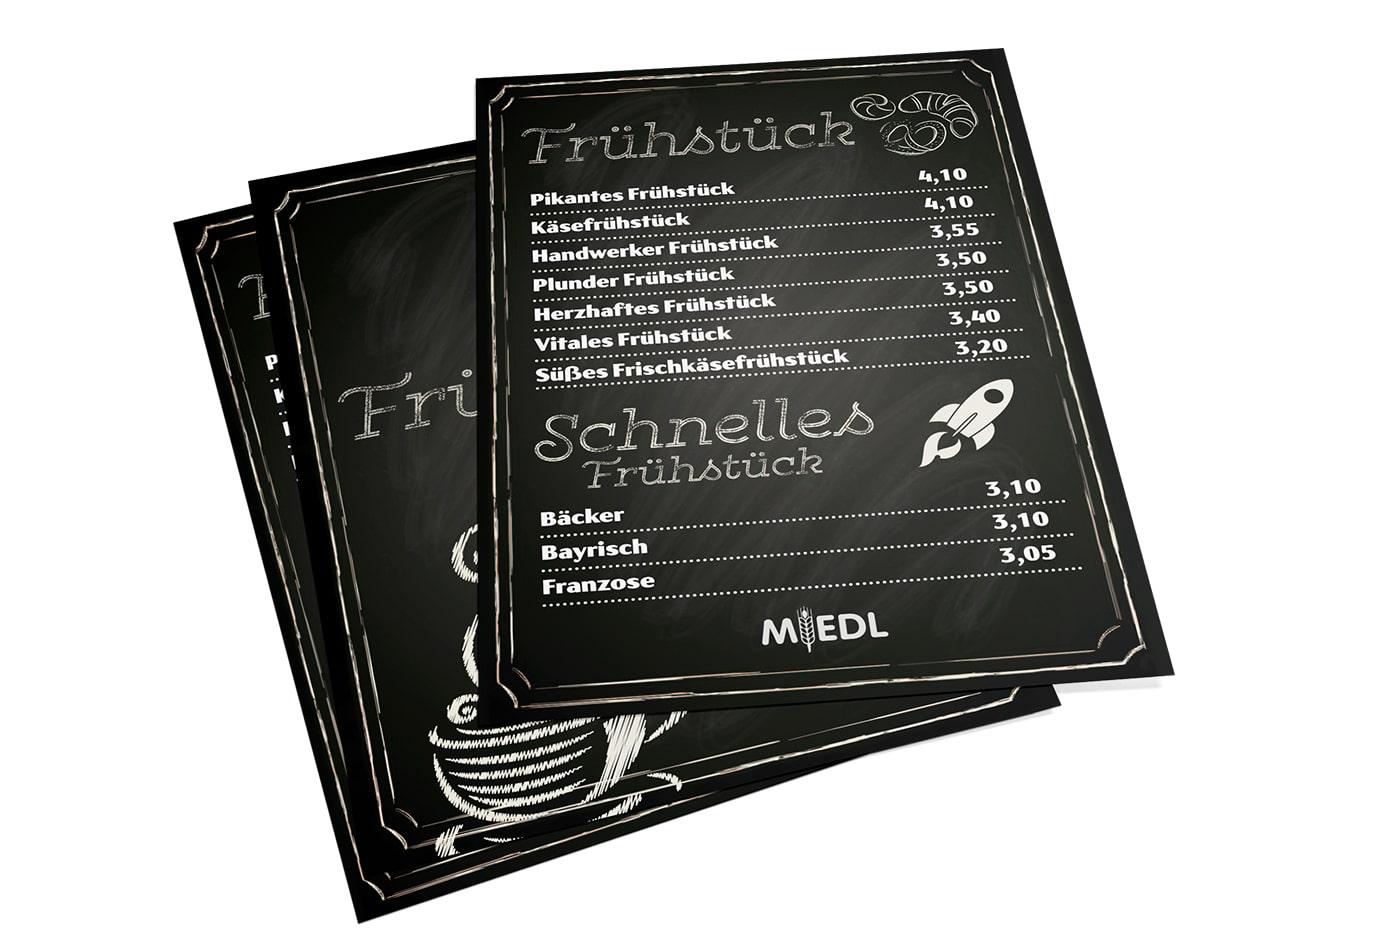 Miedl Frühstückskarten